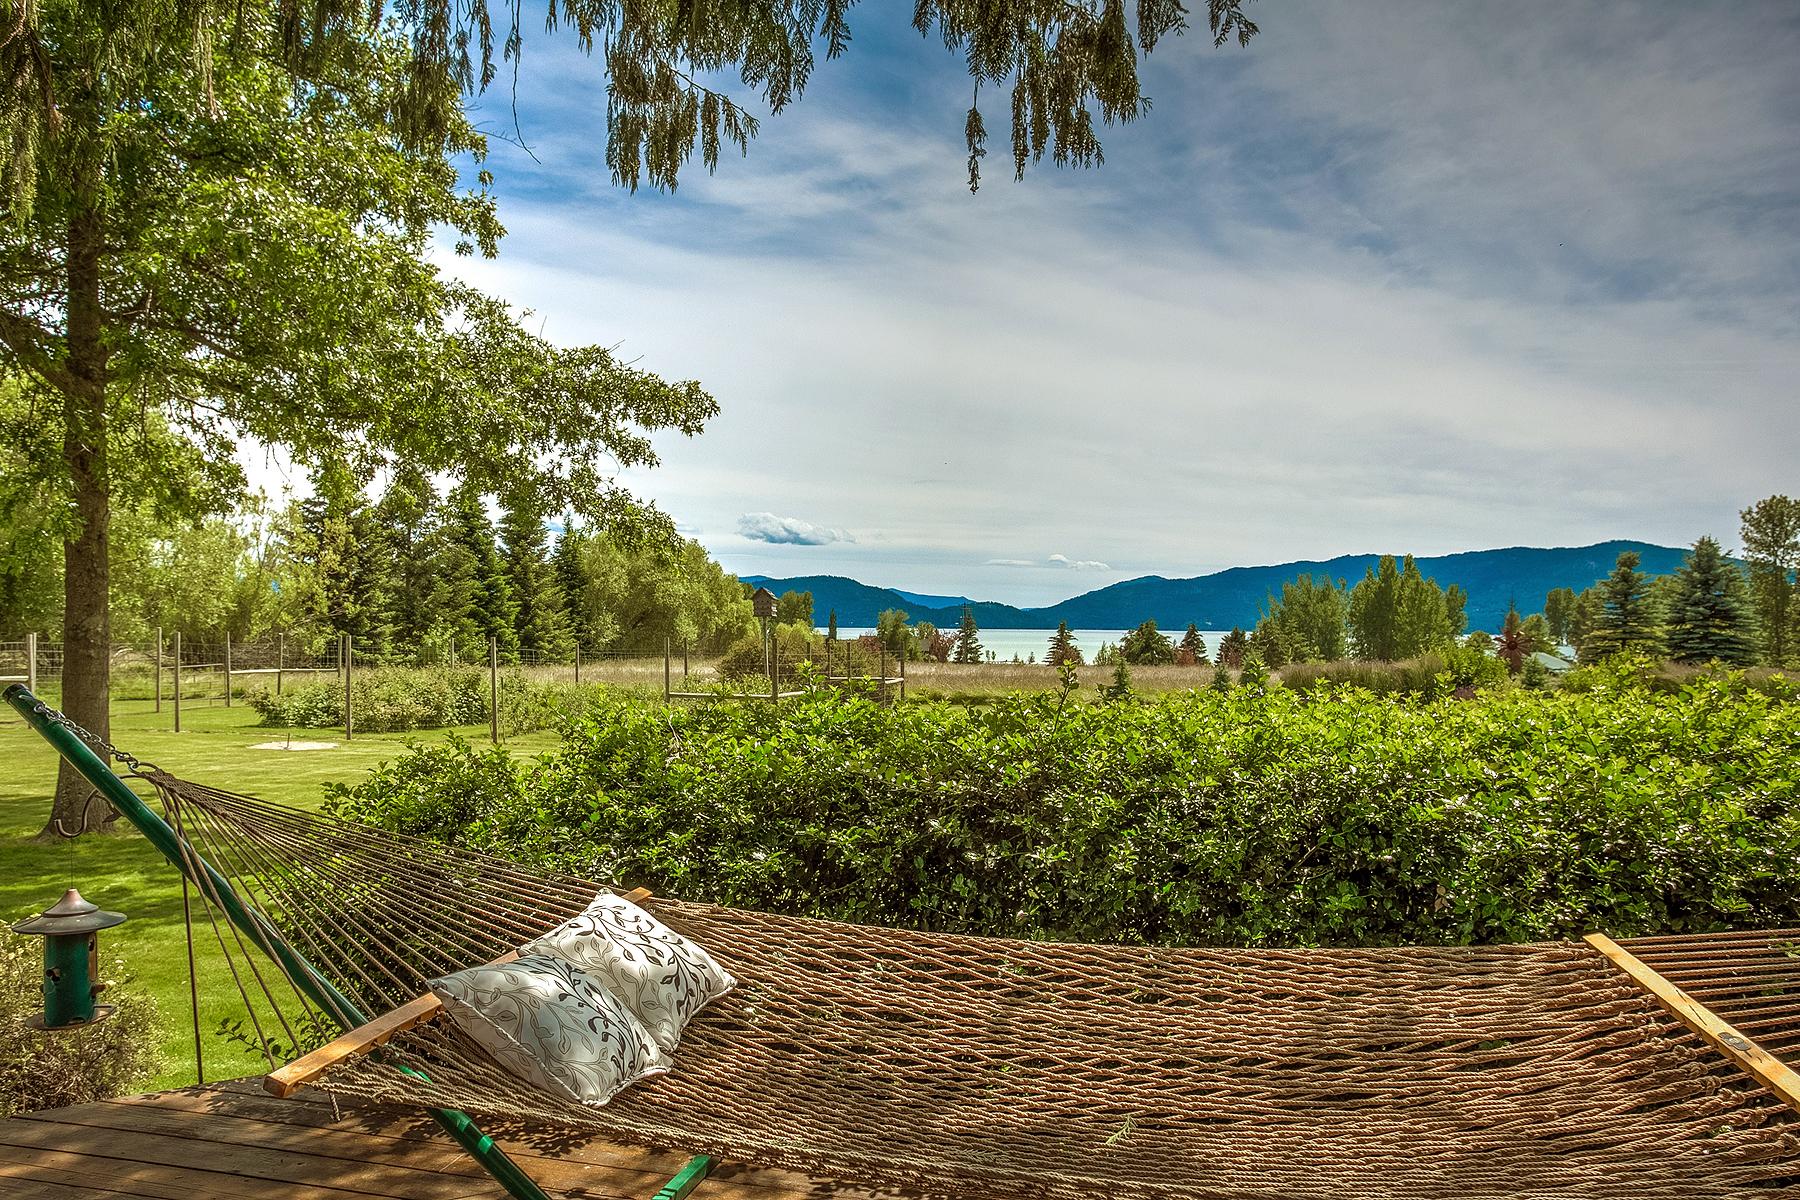 Single Family Home for Sale at Sunnyside Waterfront Estate 327 Sunnyside Sandpoint, Idaho, 83864 United States